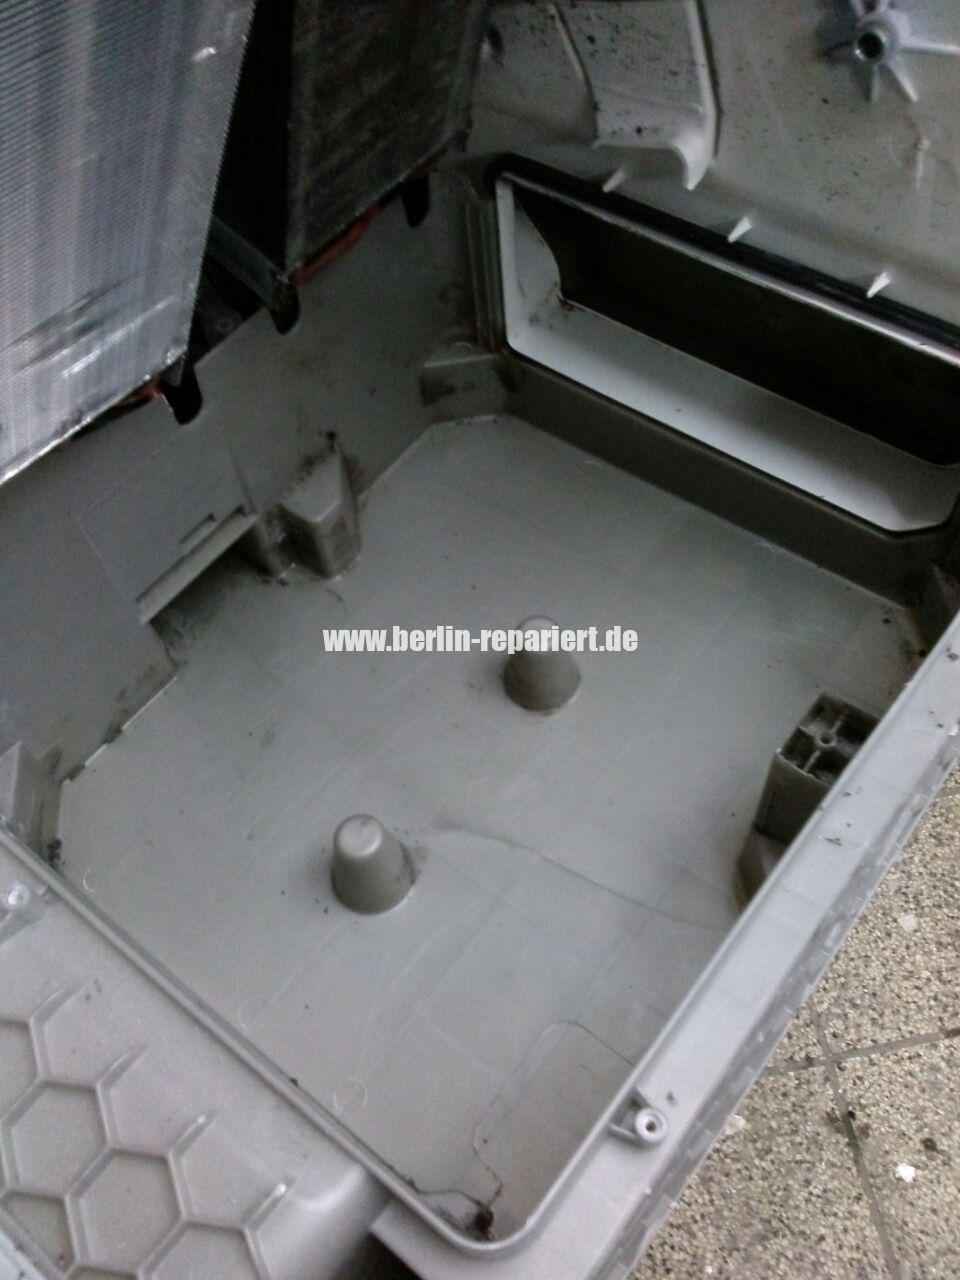 siemens wt44w161 trocknet nicht mehr leon s blog. Black Bedroom Furniture Sets. Home Design Ideas